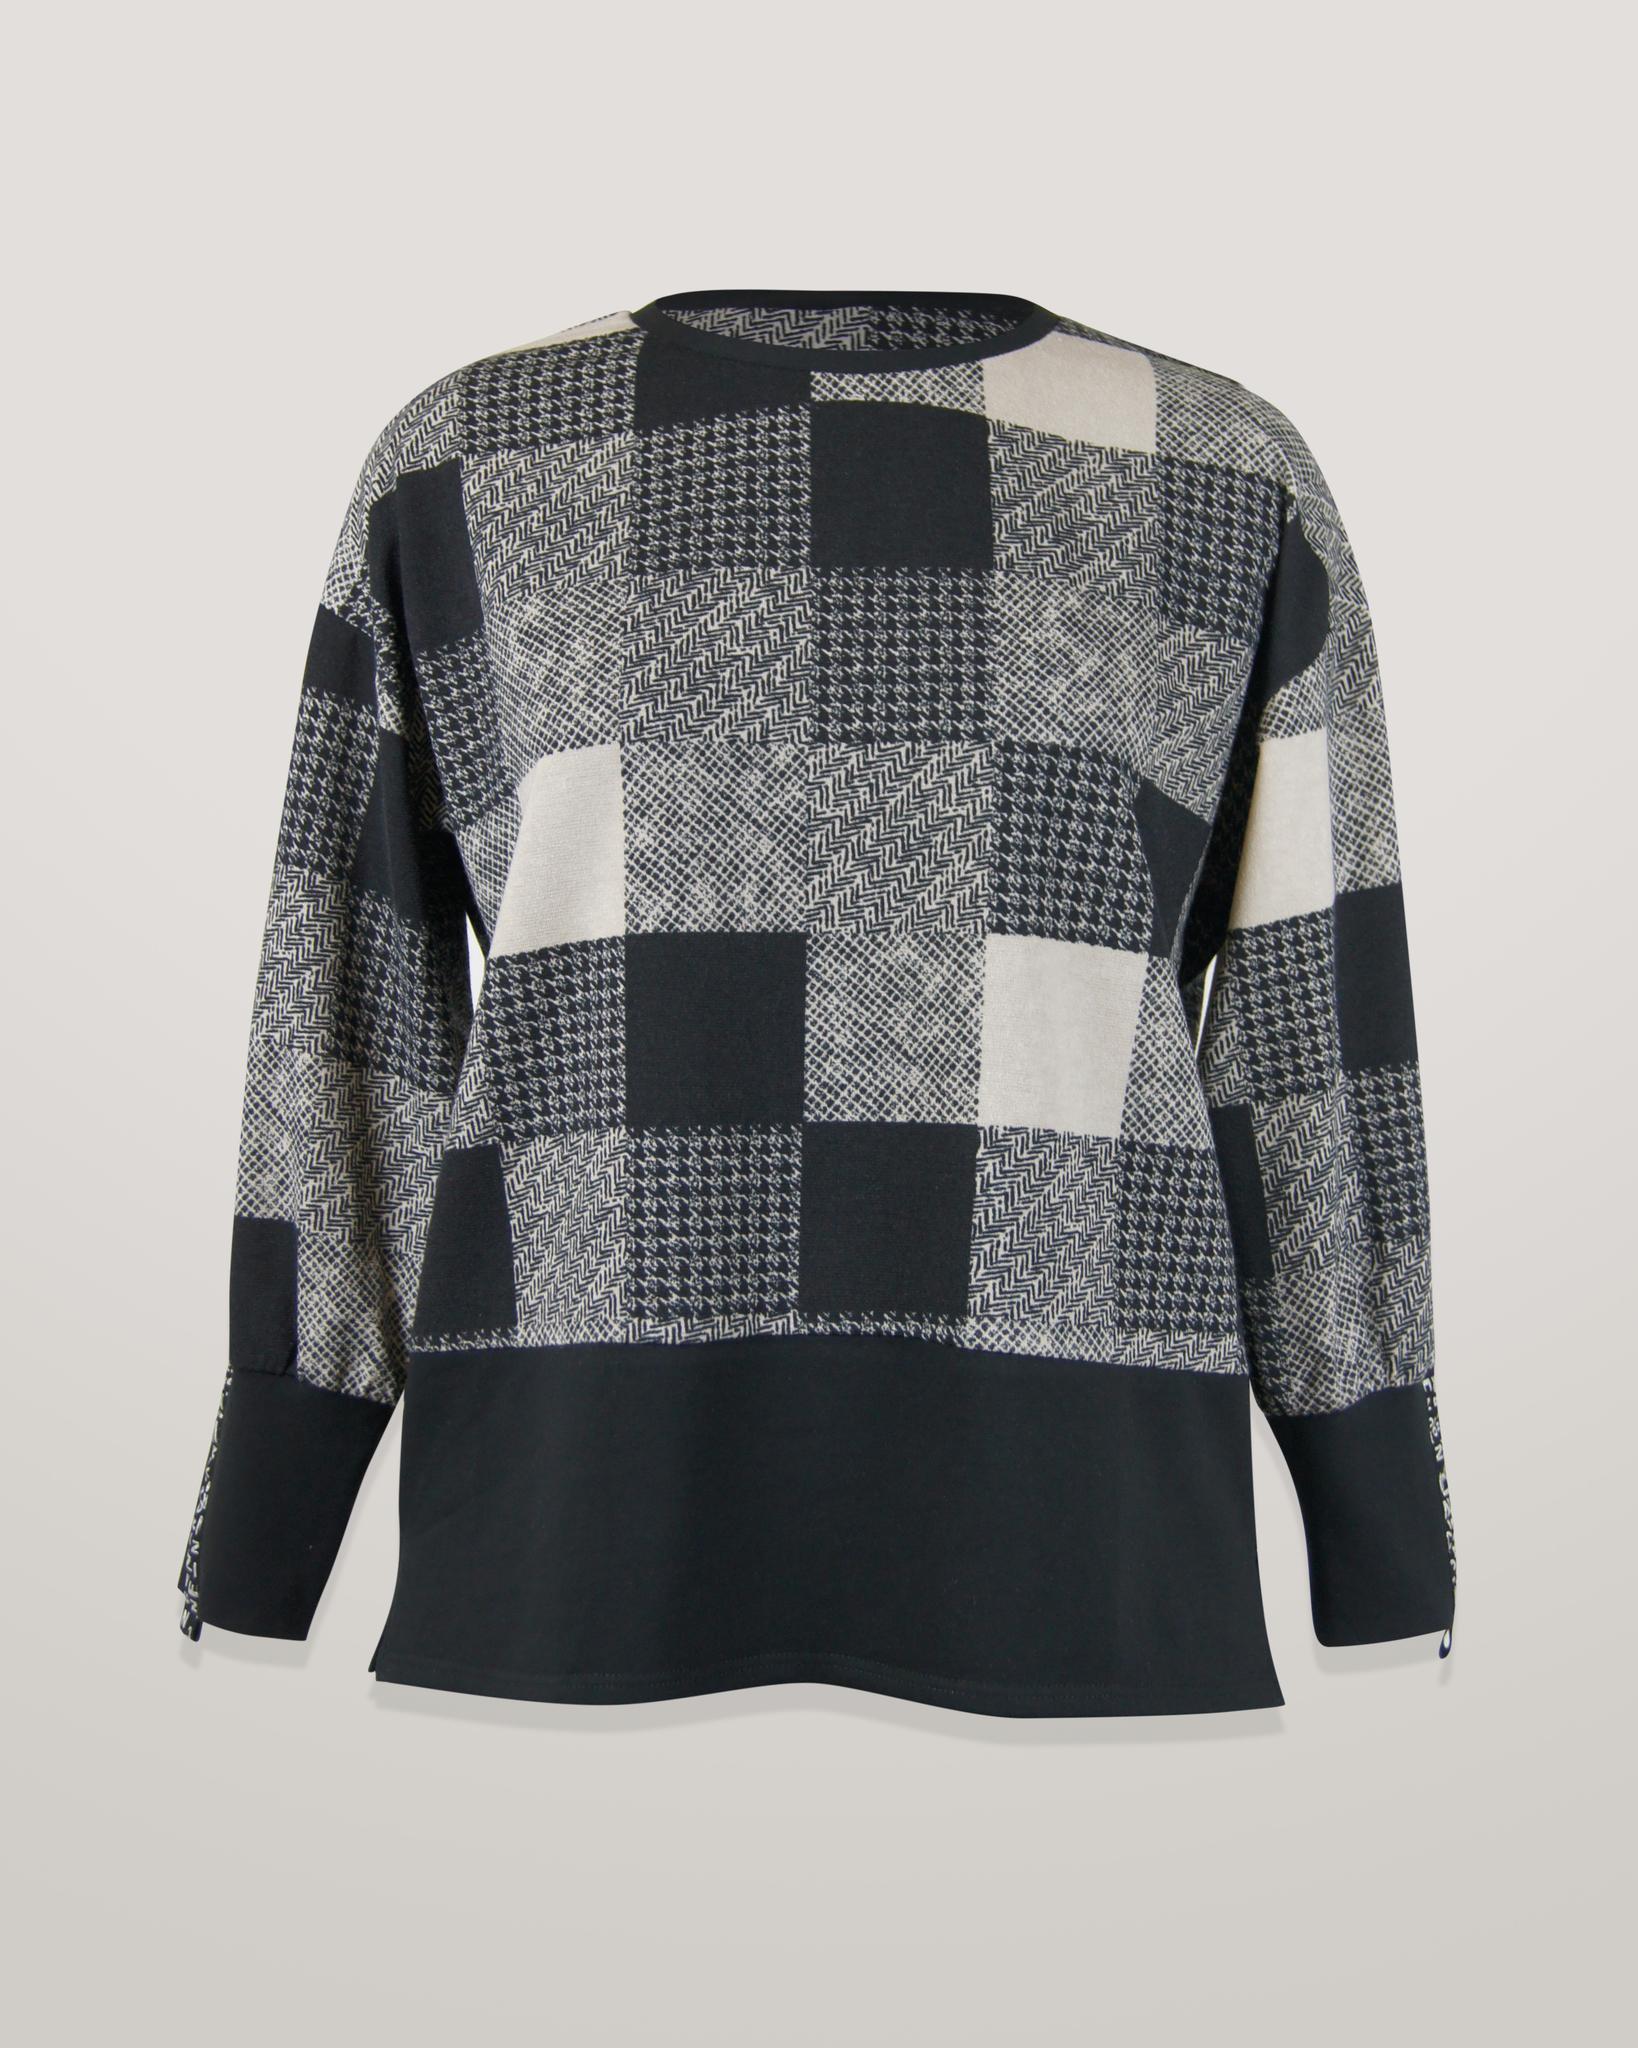 Блузка Elite 9043 квадраты 3/4